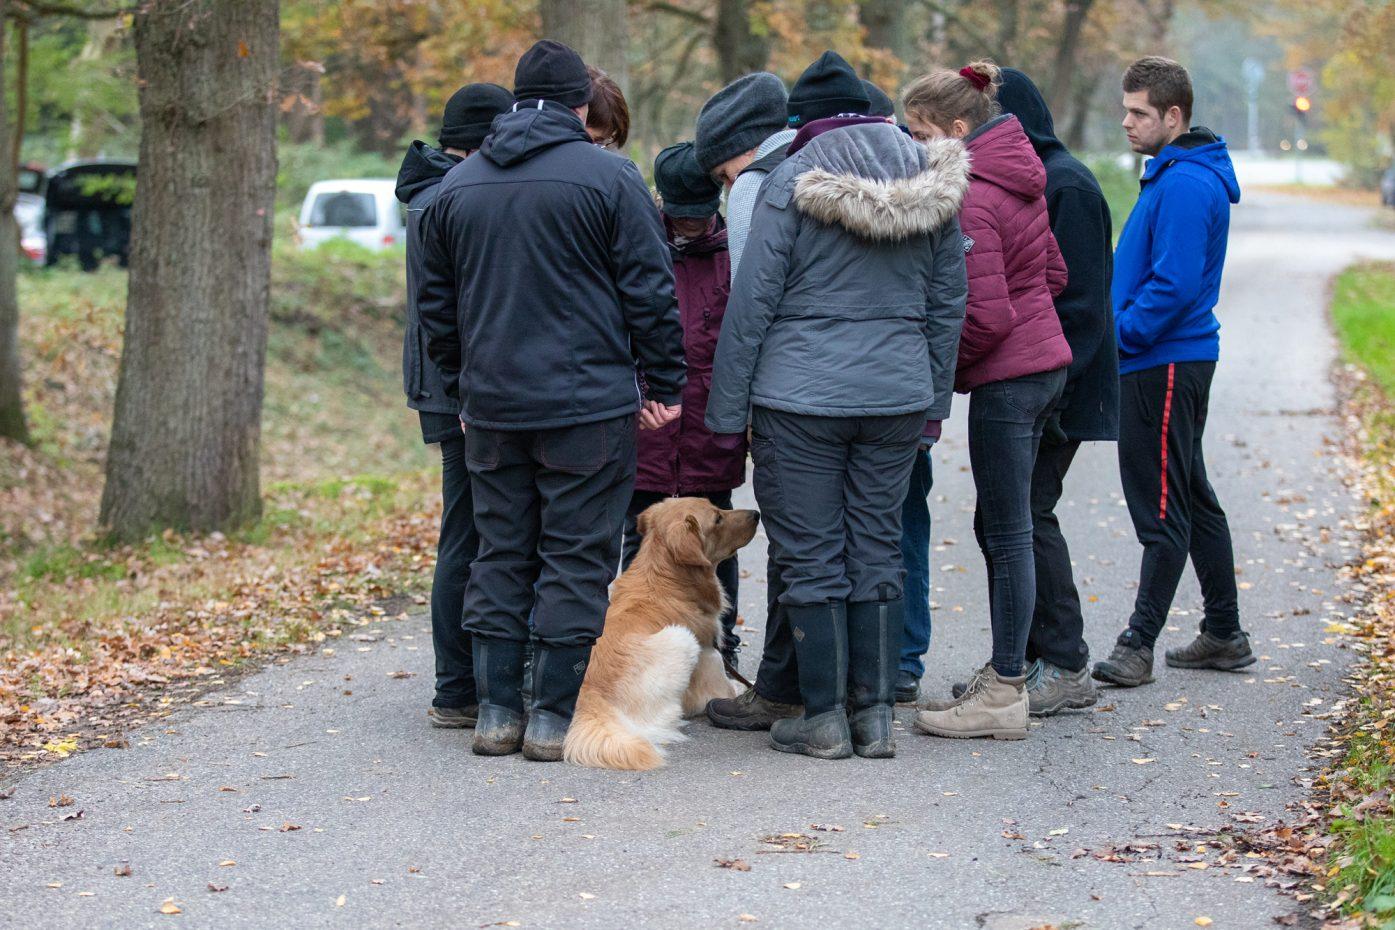 Leistungsprüfung Brüggen | 17.11.2019 1